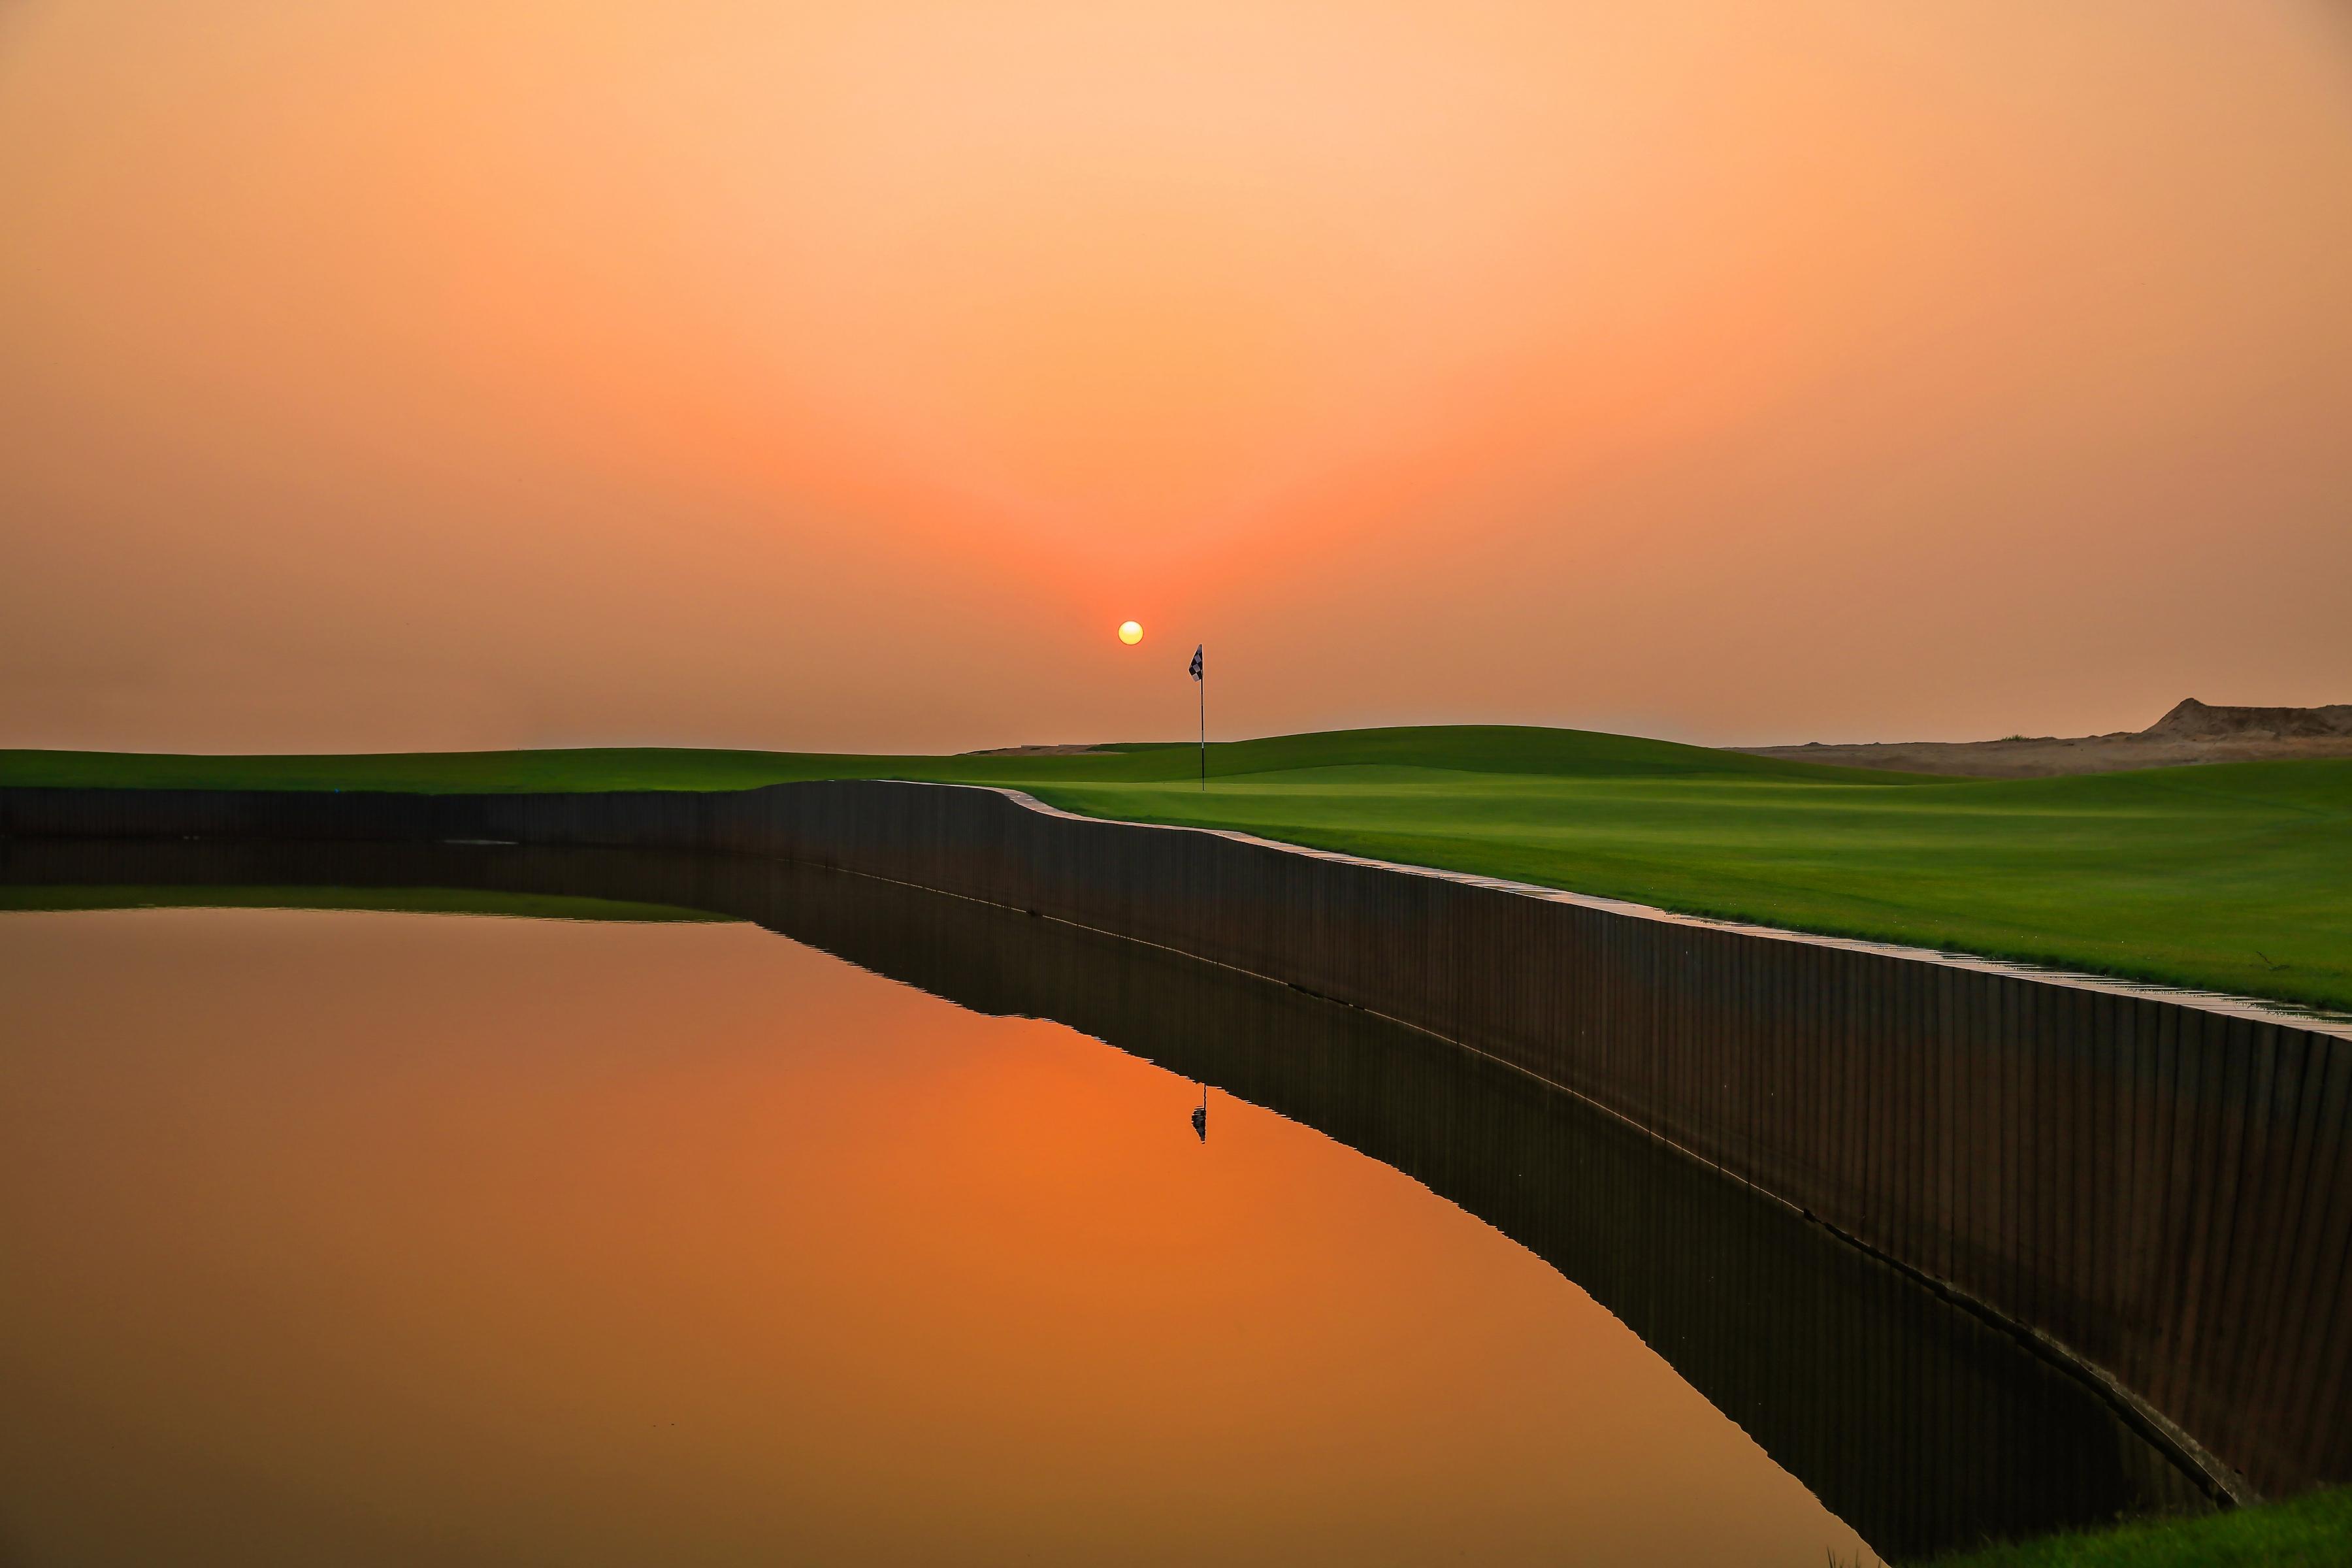 Overview of golf course named Al Zorah Golf Club